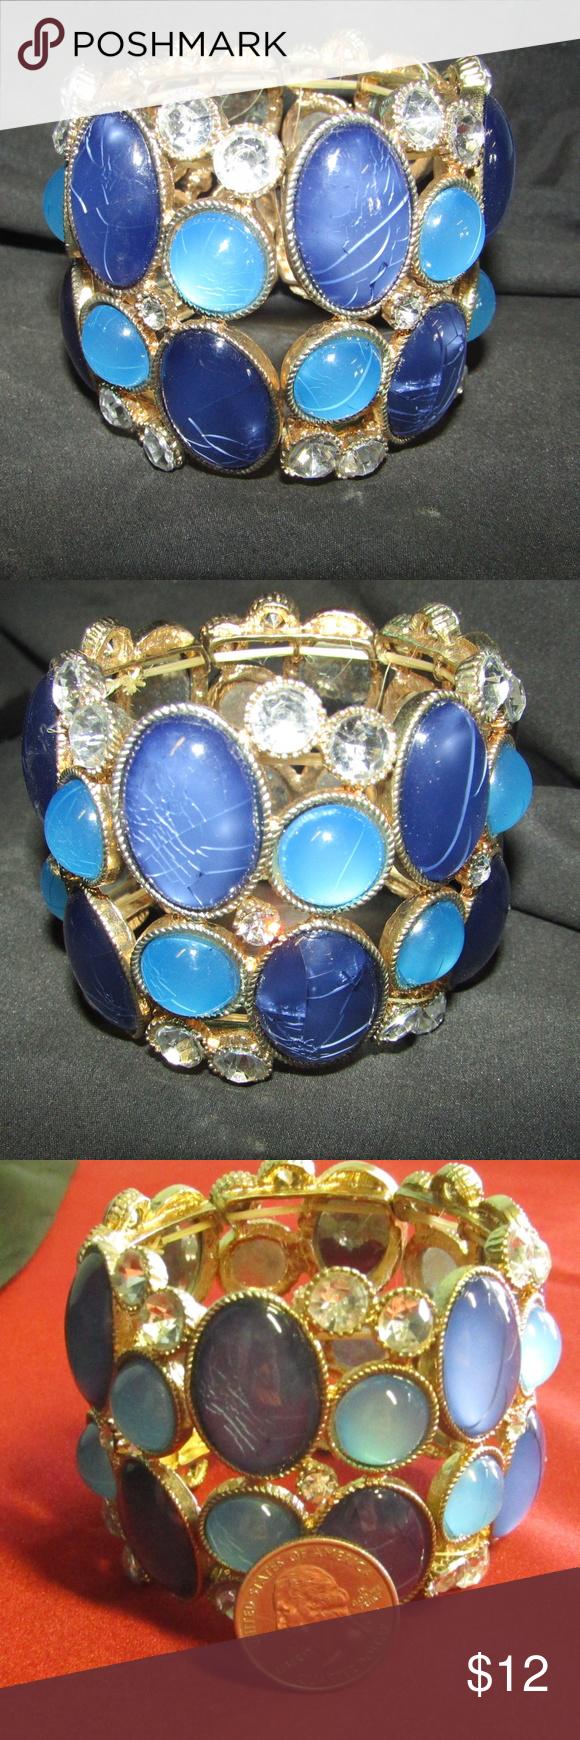 Blue crackle glass & rhinestone cuff bracelet NWOT A large